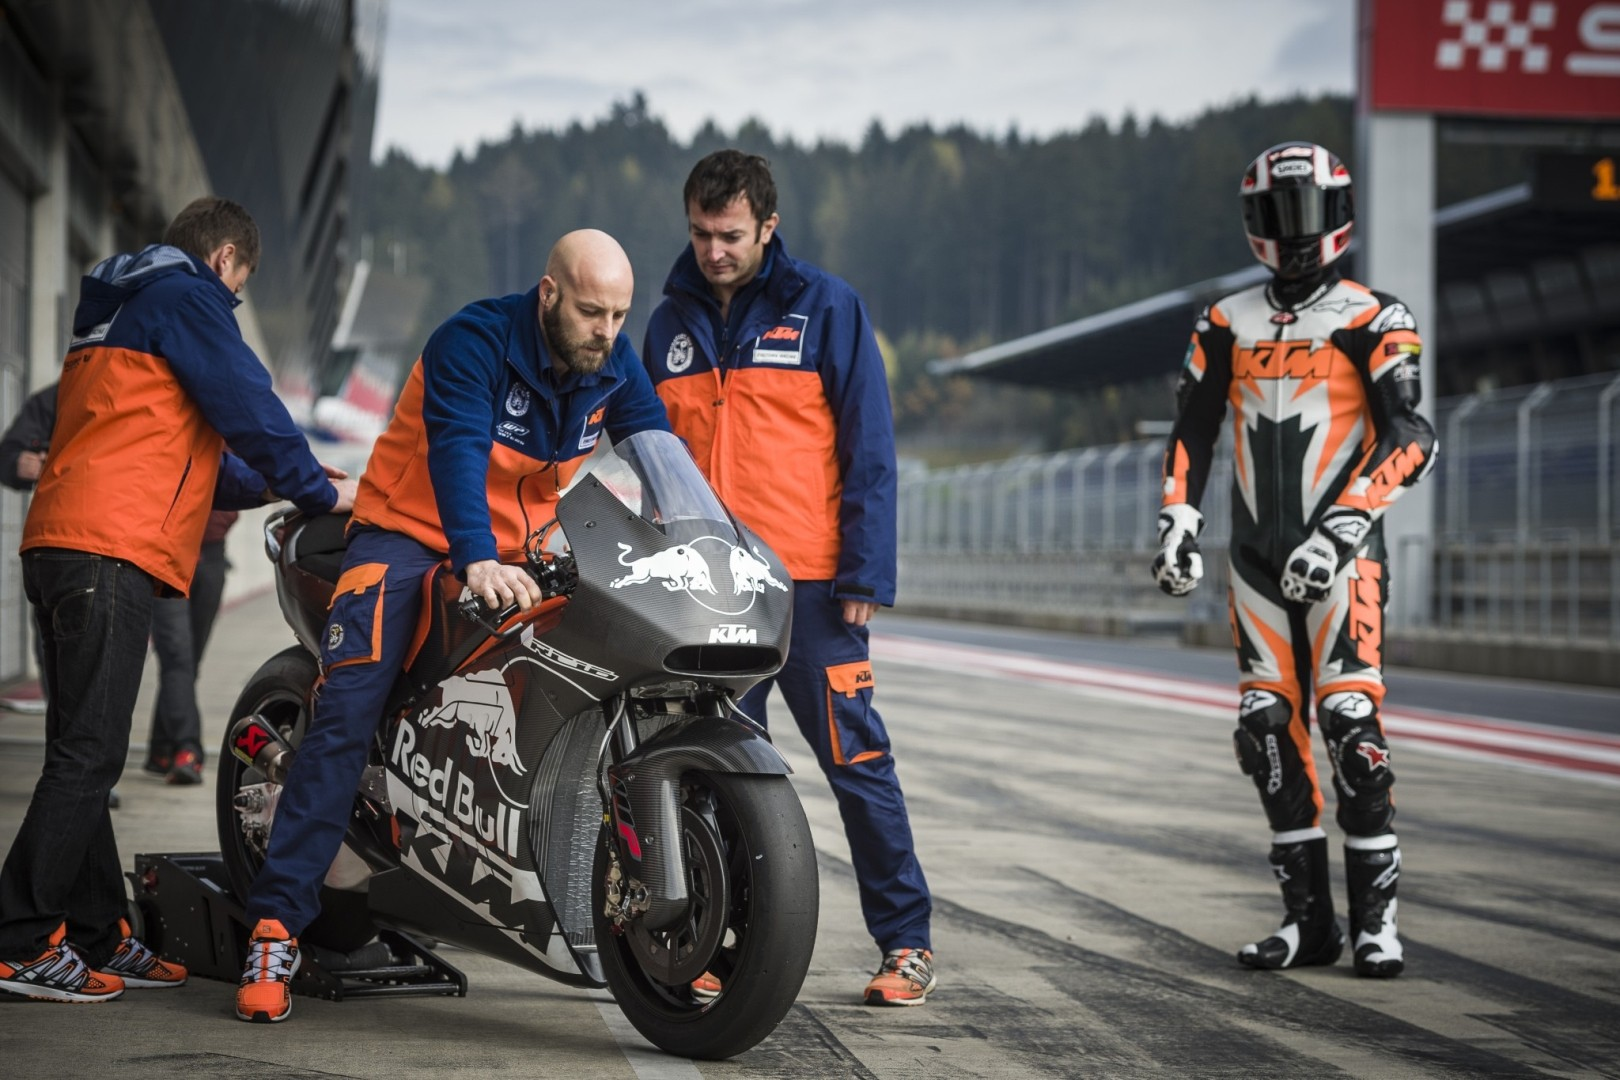 More KTM RC16 MotoGP Prototype Pics Show the 2017 Contender in Detail - autoevolution